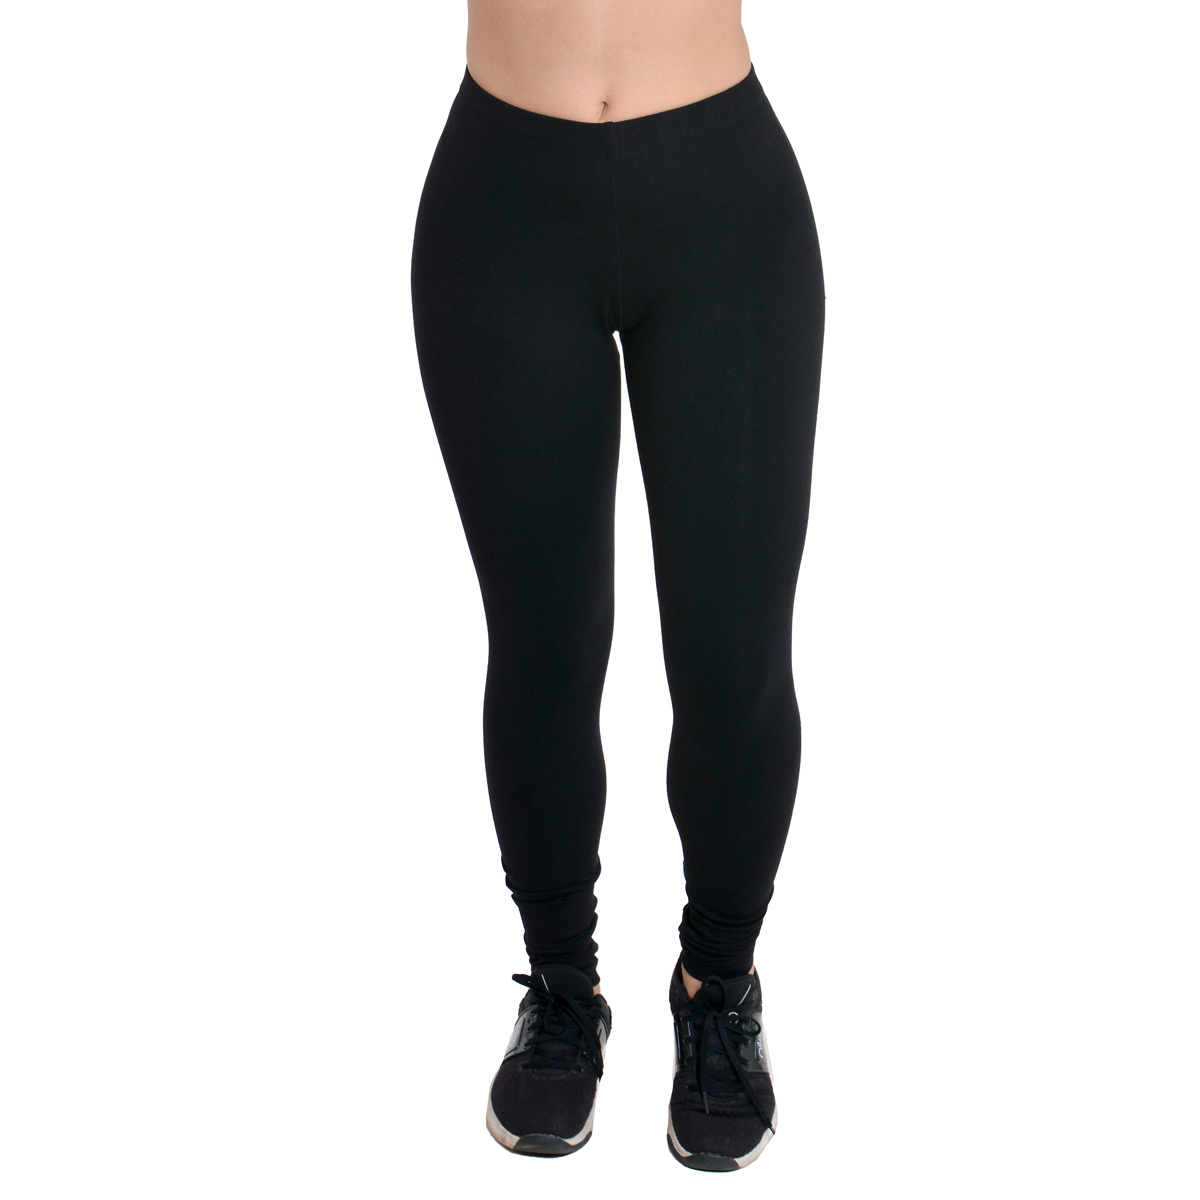 Calça Legging feminina Comfort Trifil